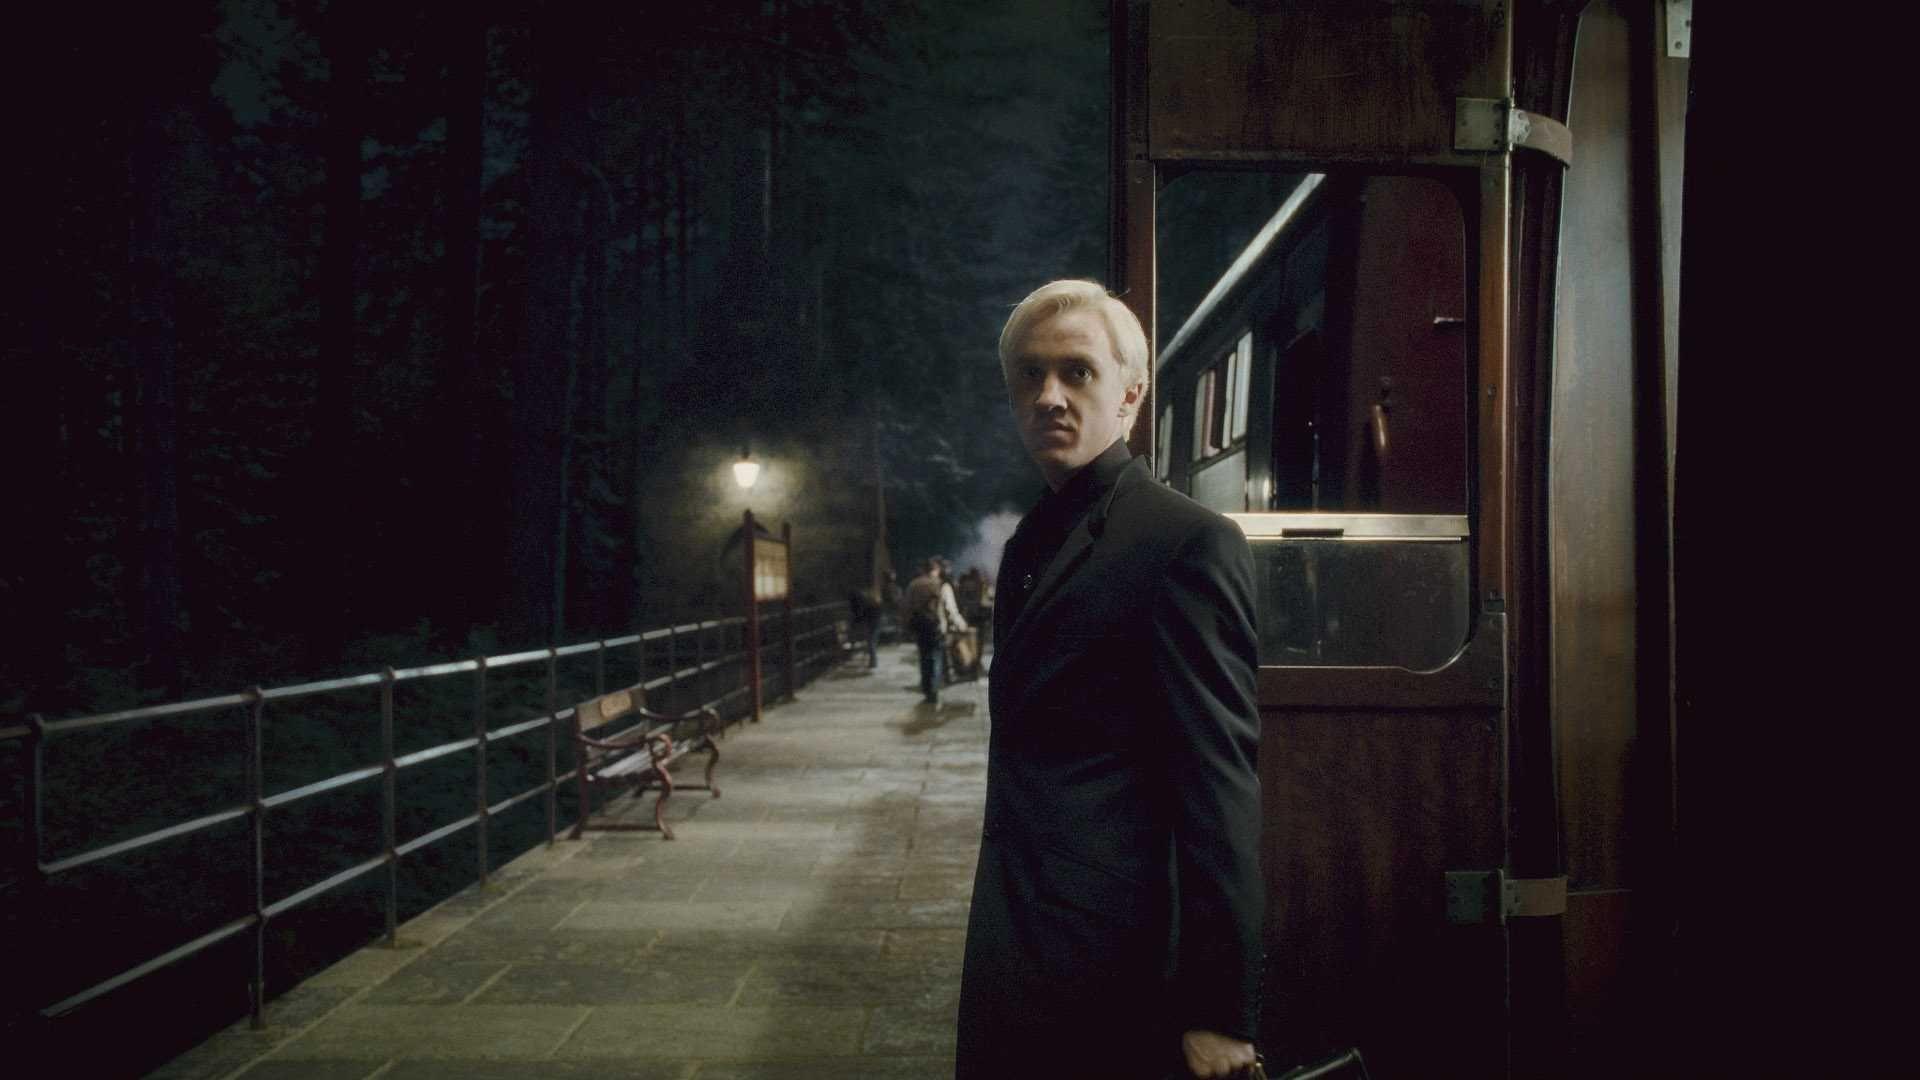 Draco Malfoy Draco Malfoy Draco Malfoy